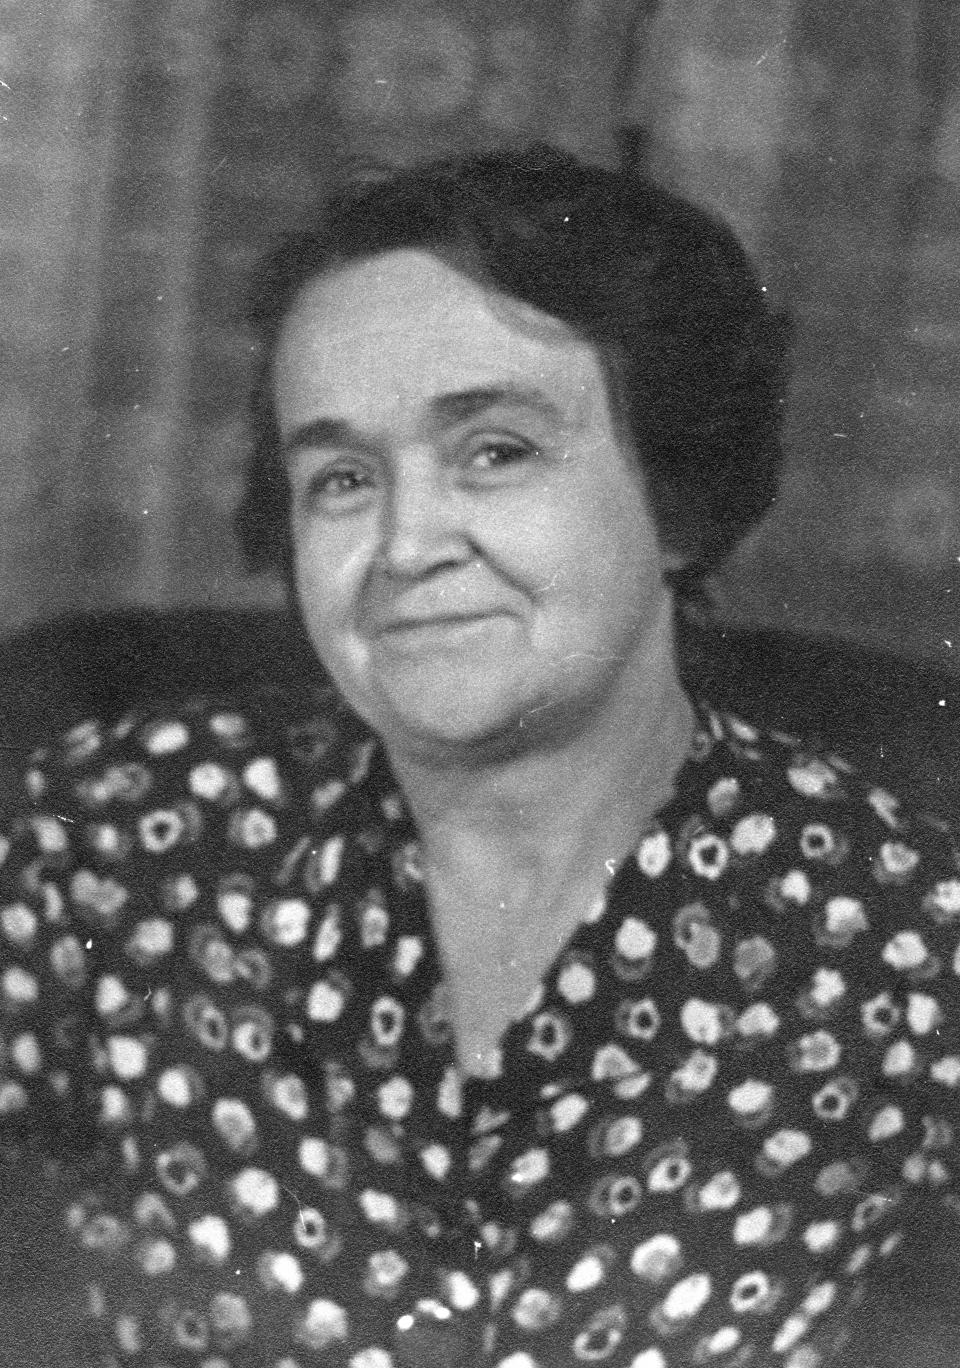 My Grandmother, Raleigh May George Farrar